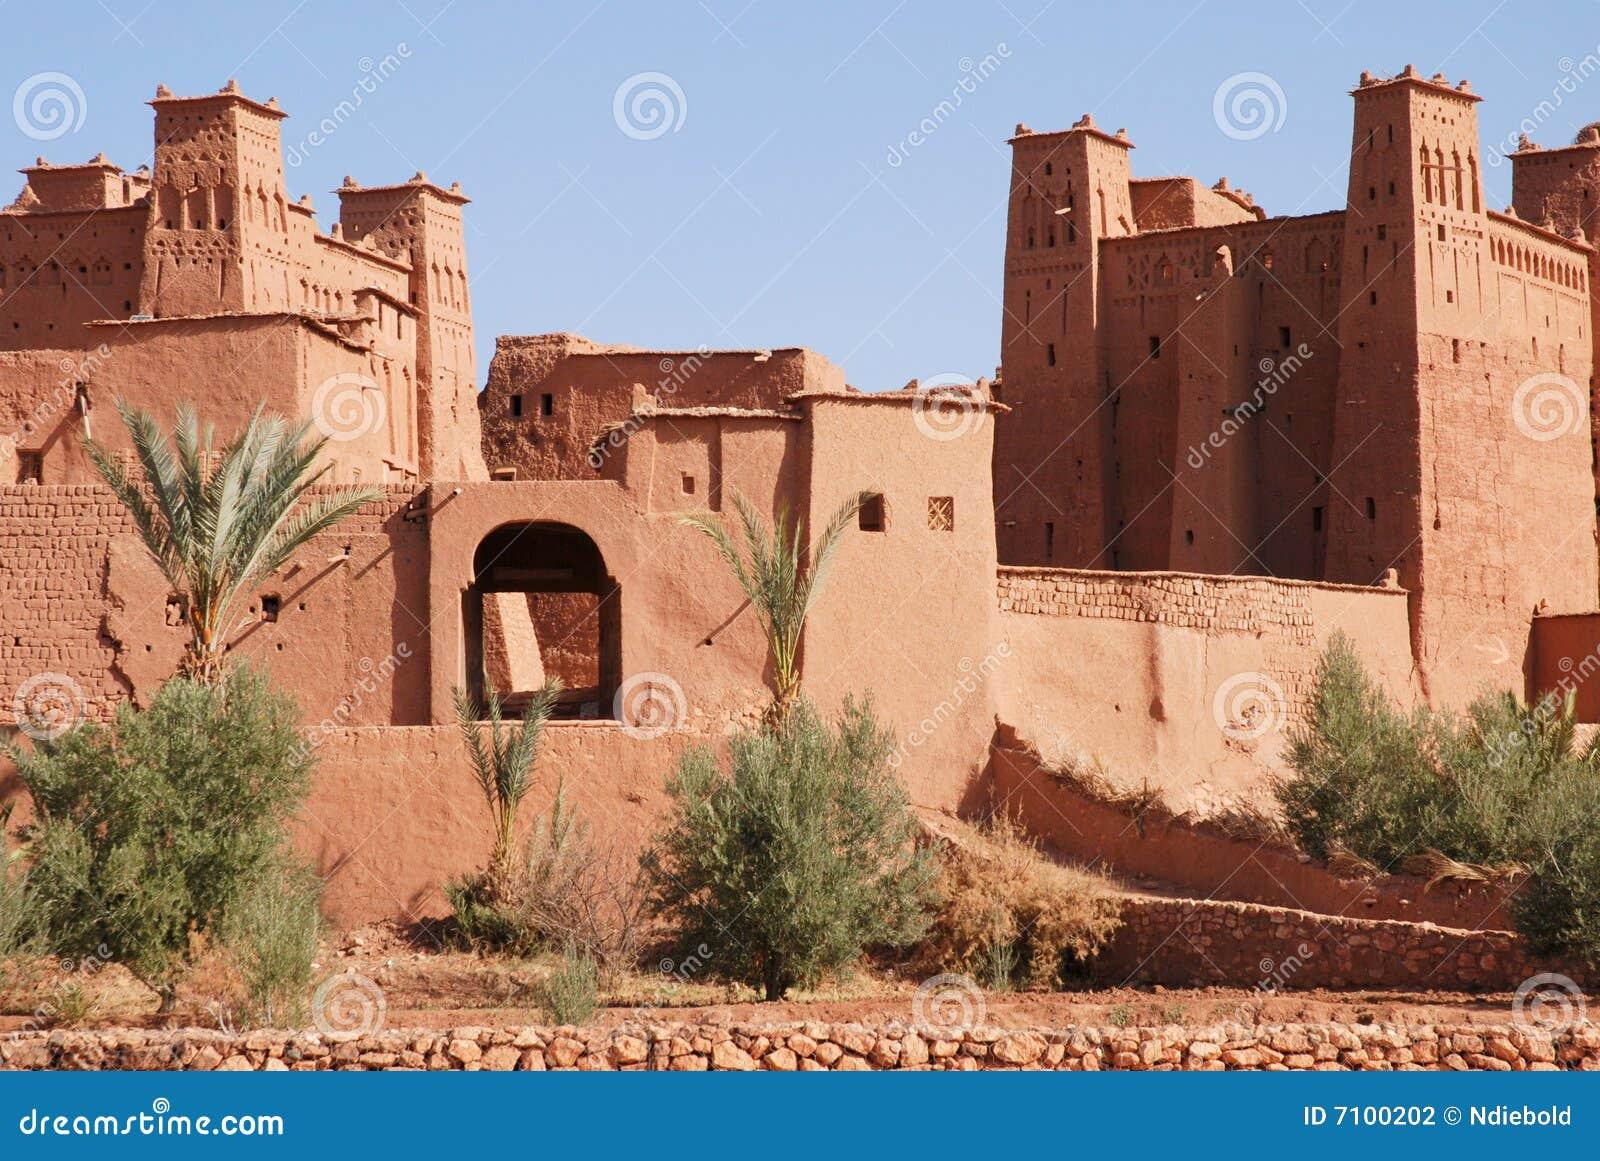 Arabian Town Ait Benhaddou, Morocco